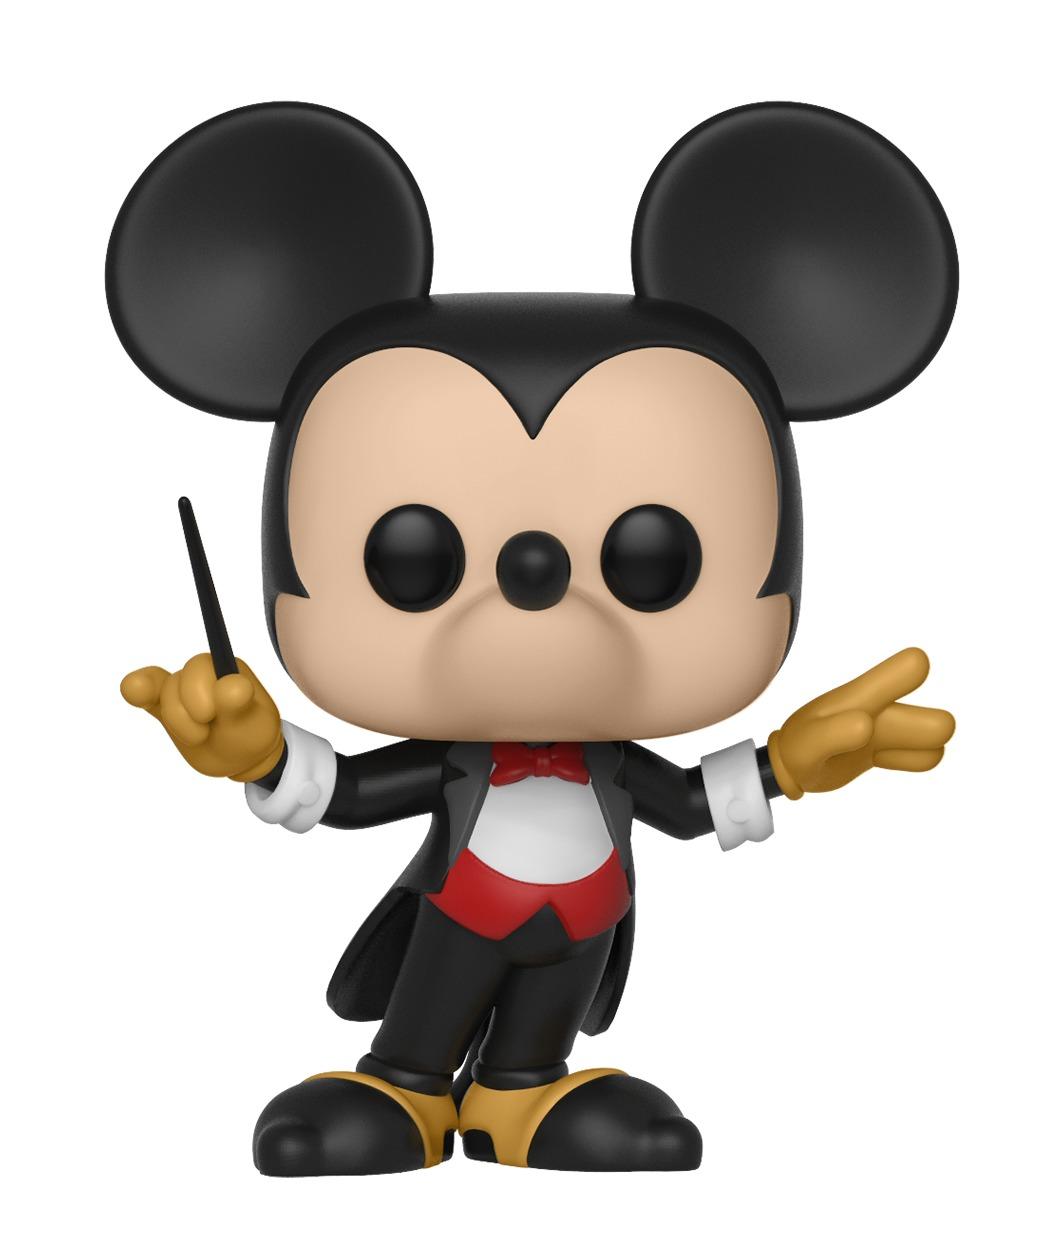 Disney: Conductor Mickey - Pop! Vinyl Figure image